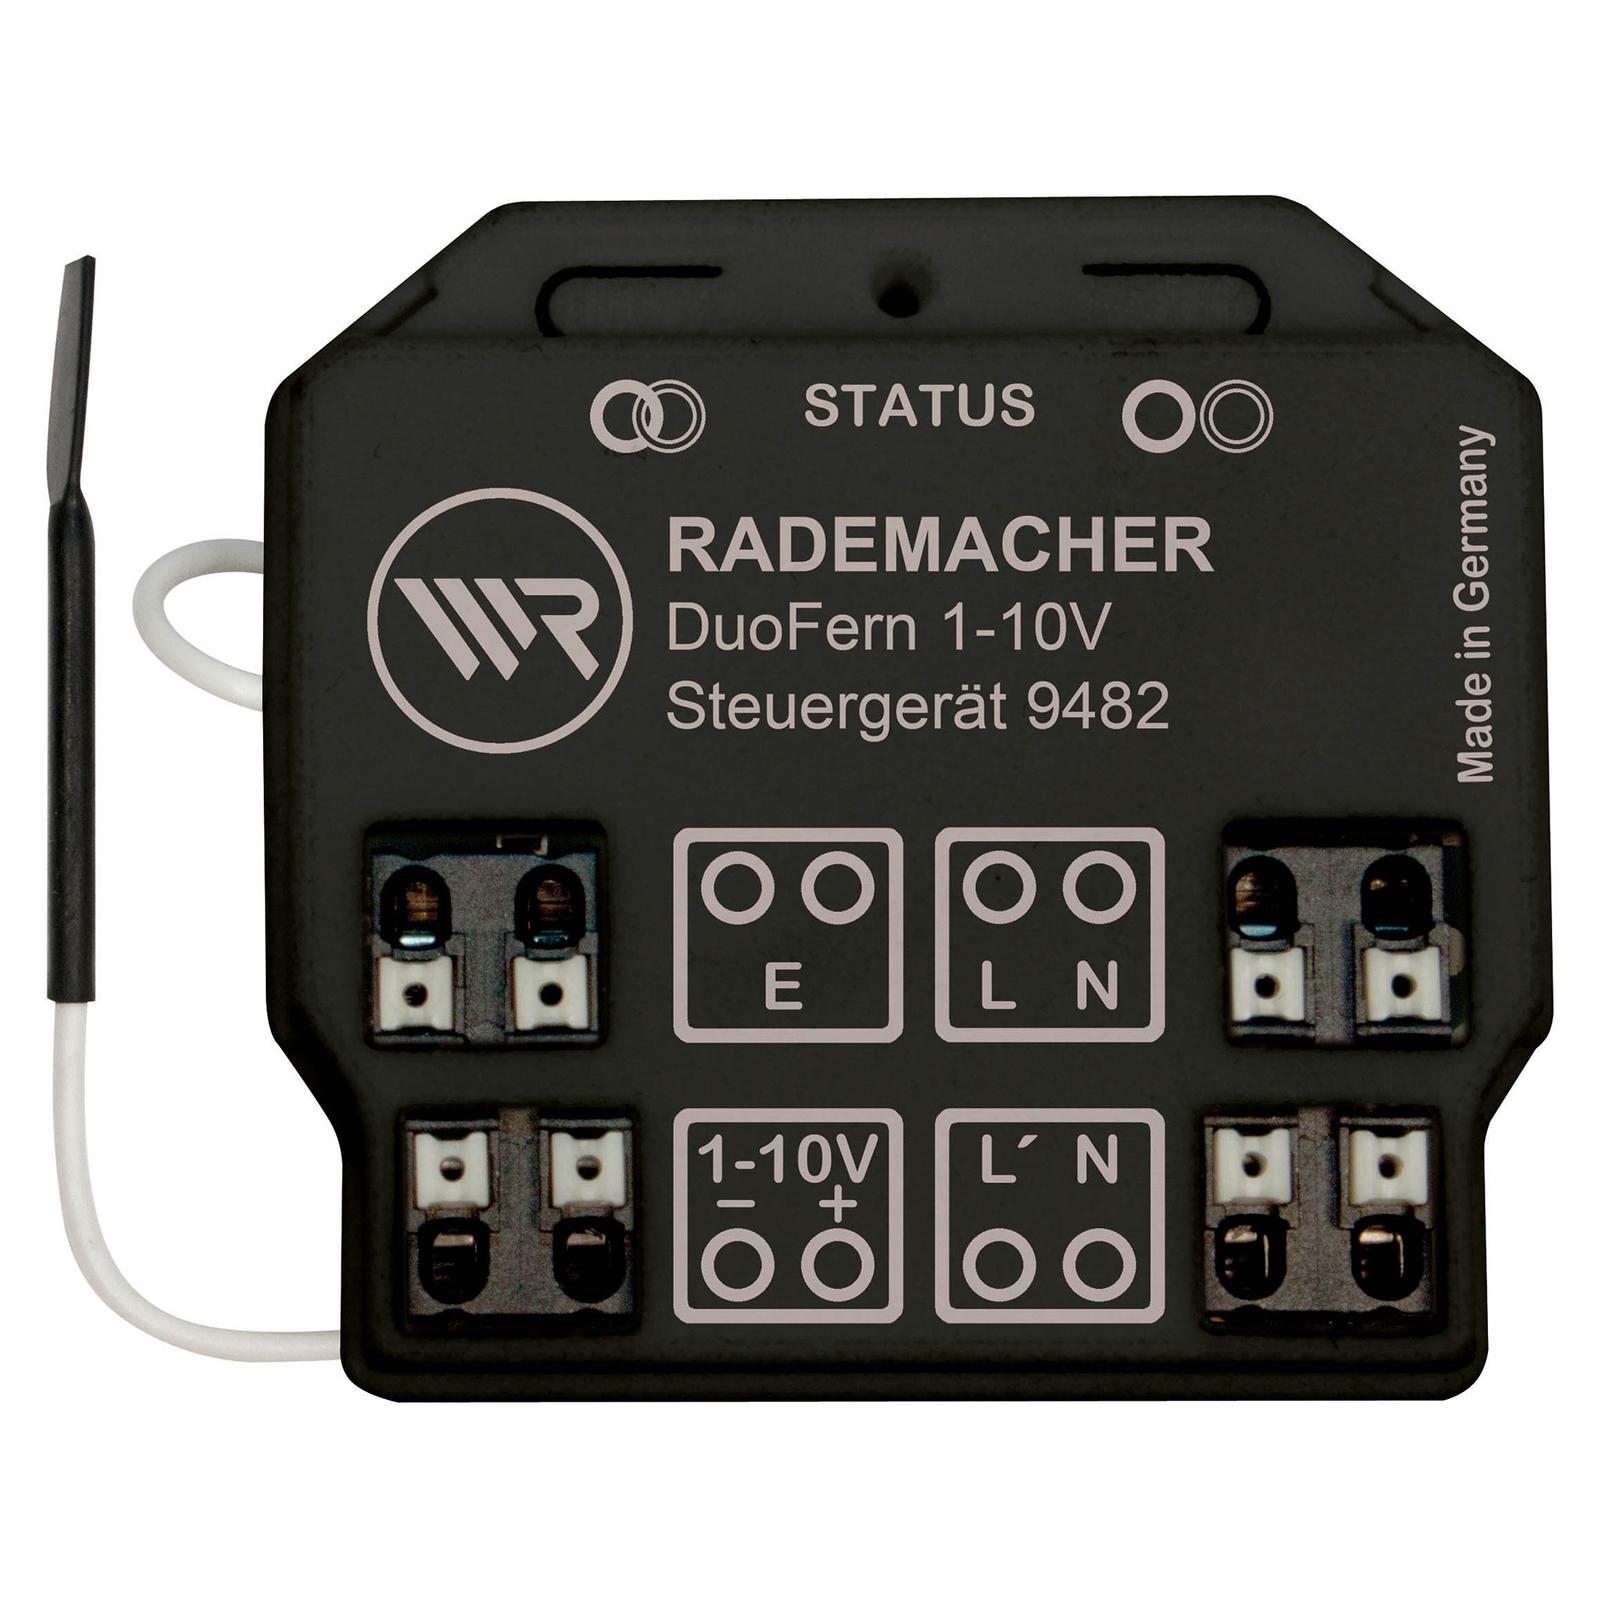 Rademacher DuoFern 1-10 V commande actionneur dim